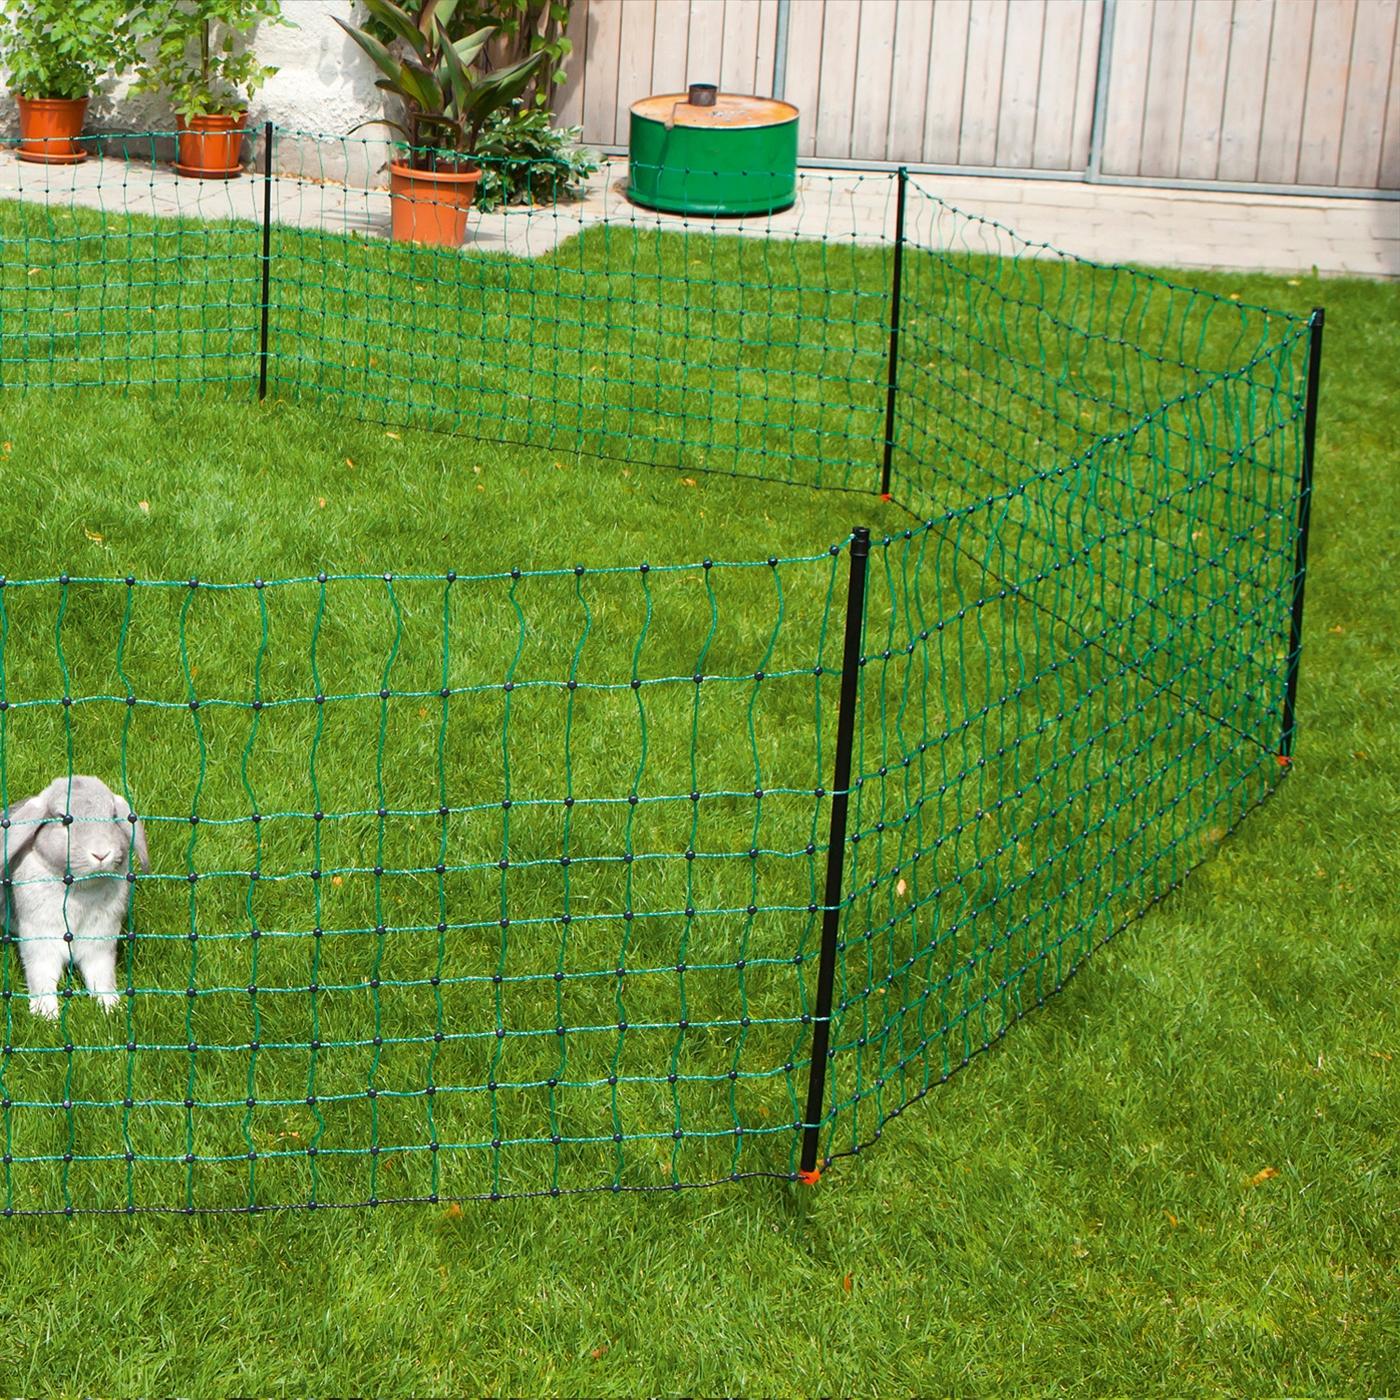 12m elektronetz netz zaun hund katze kaninchen hase marder. Black Bedroom Furniture Sets. Home Design Ideas